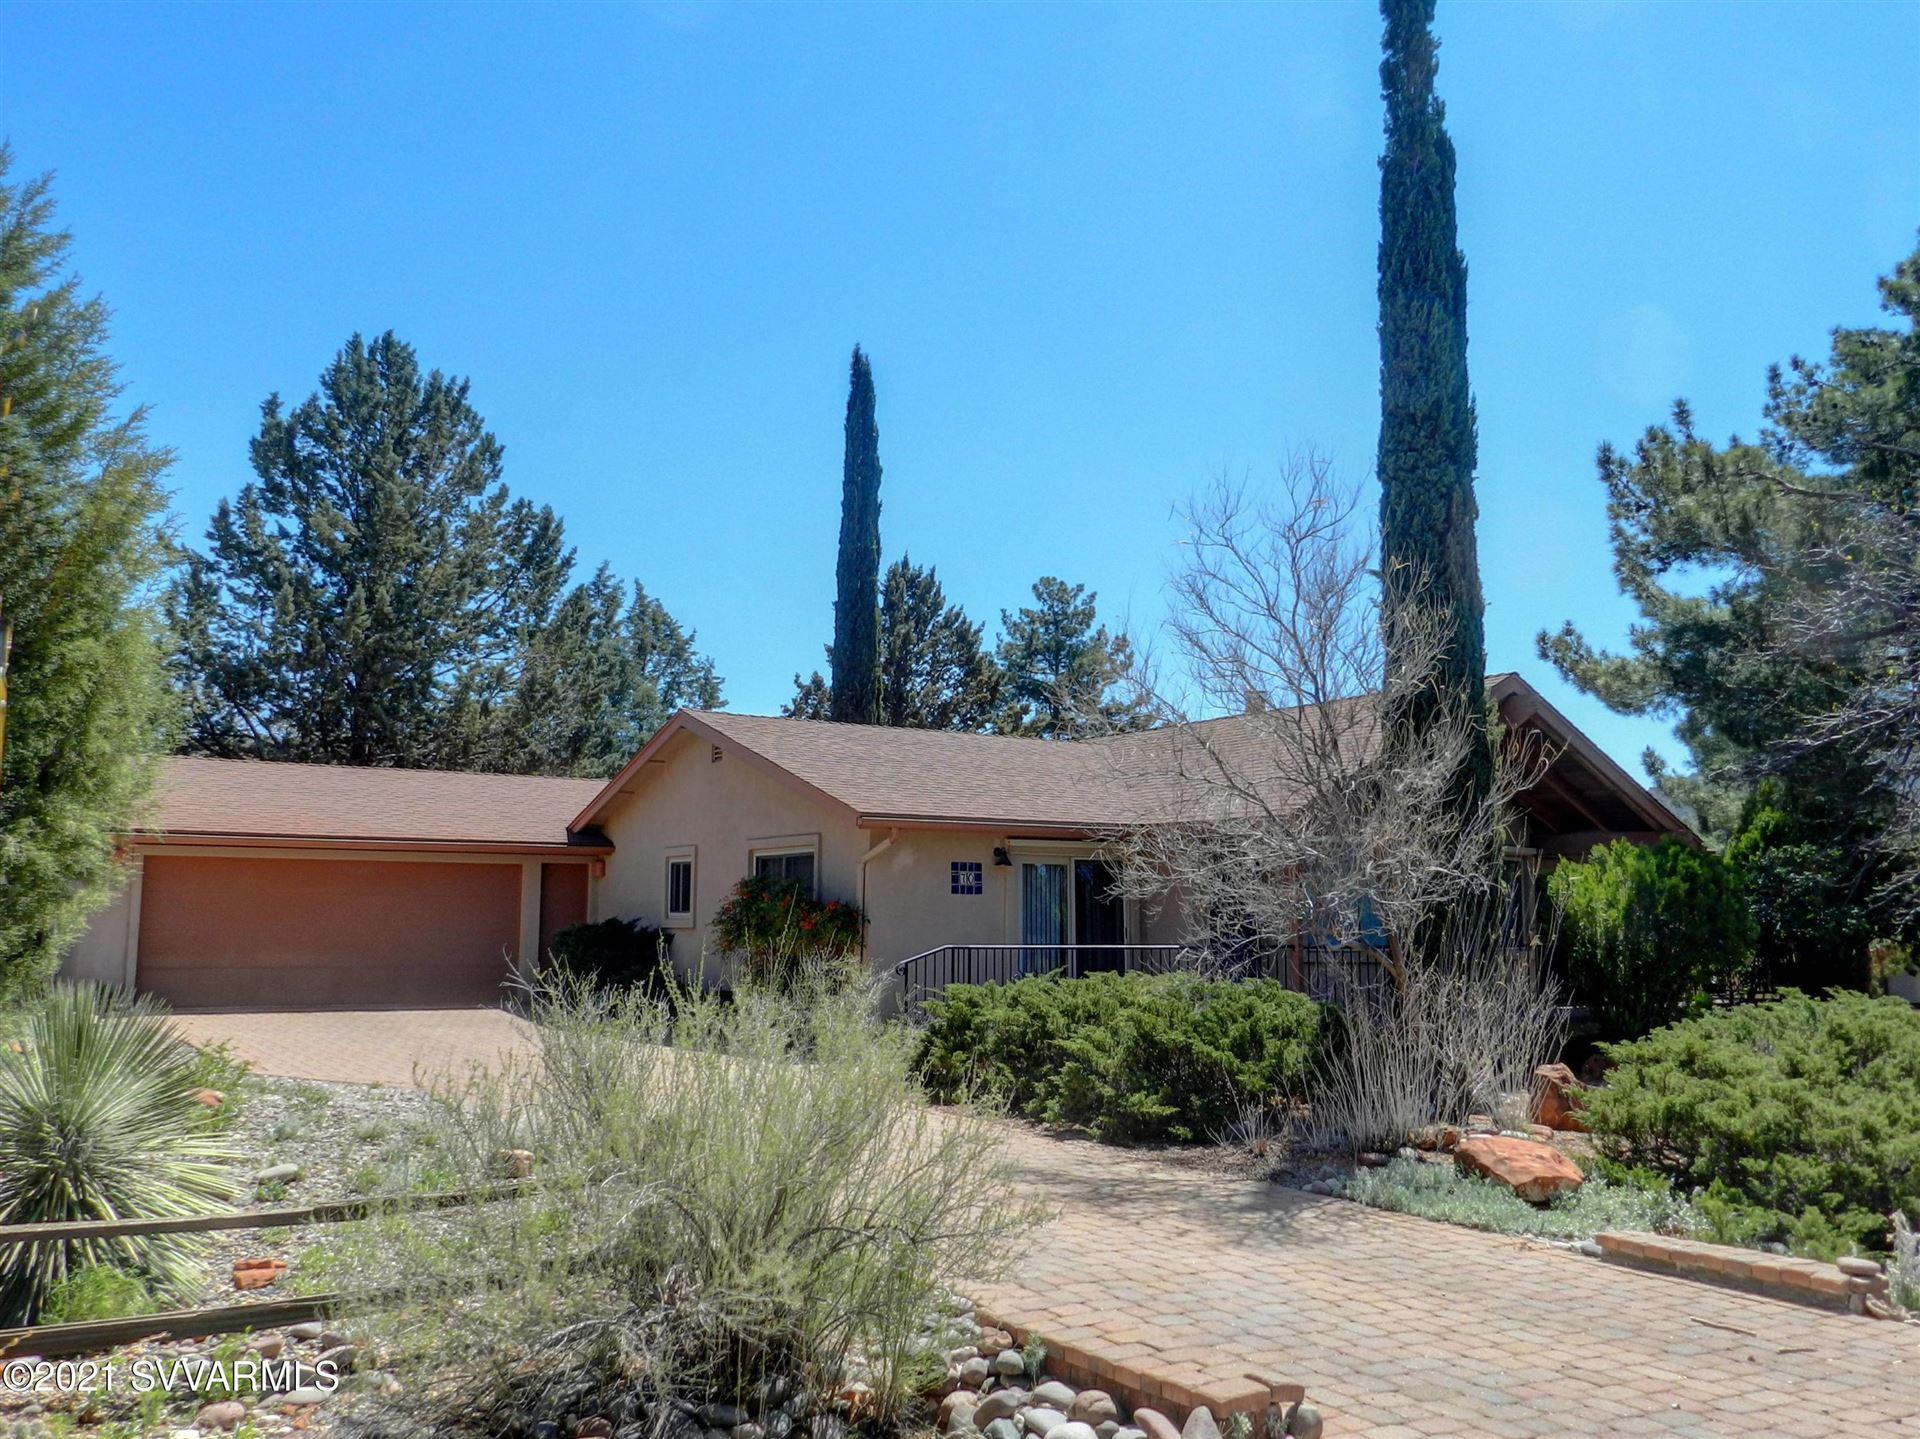 Photo of 70 Pebble Drive, Sedona, AZ 86351 (MLS # 526074)